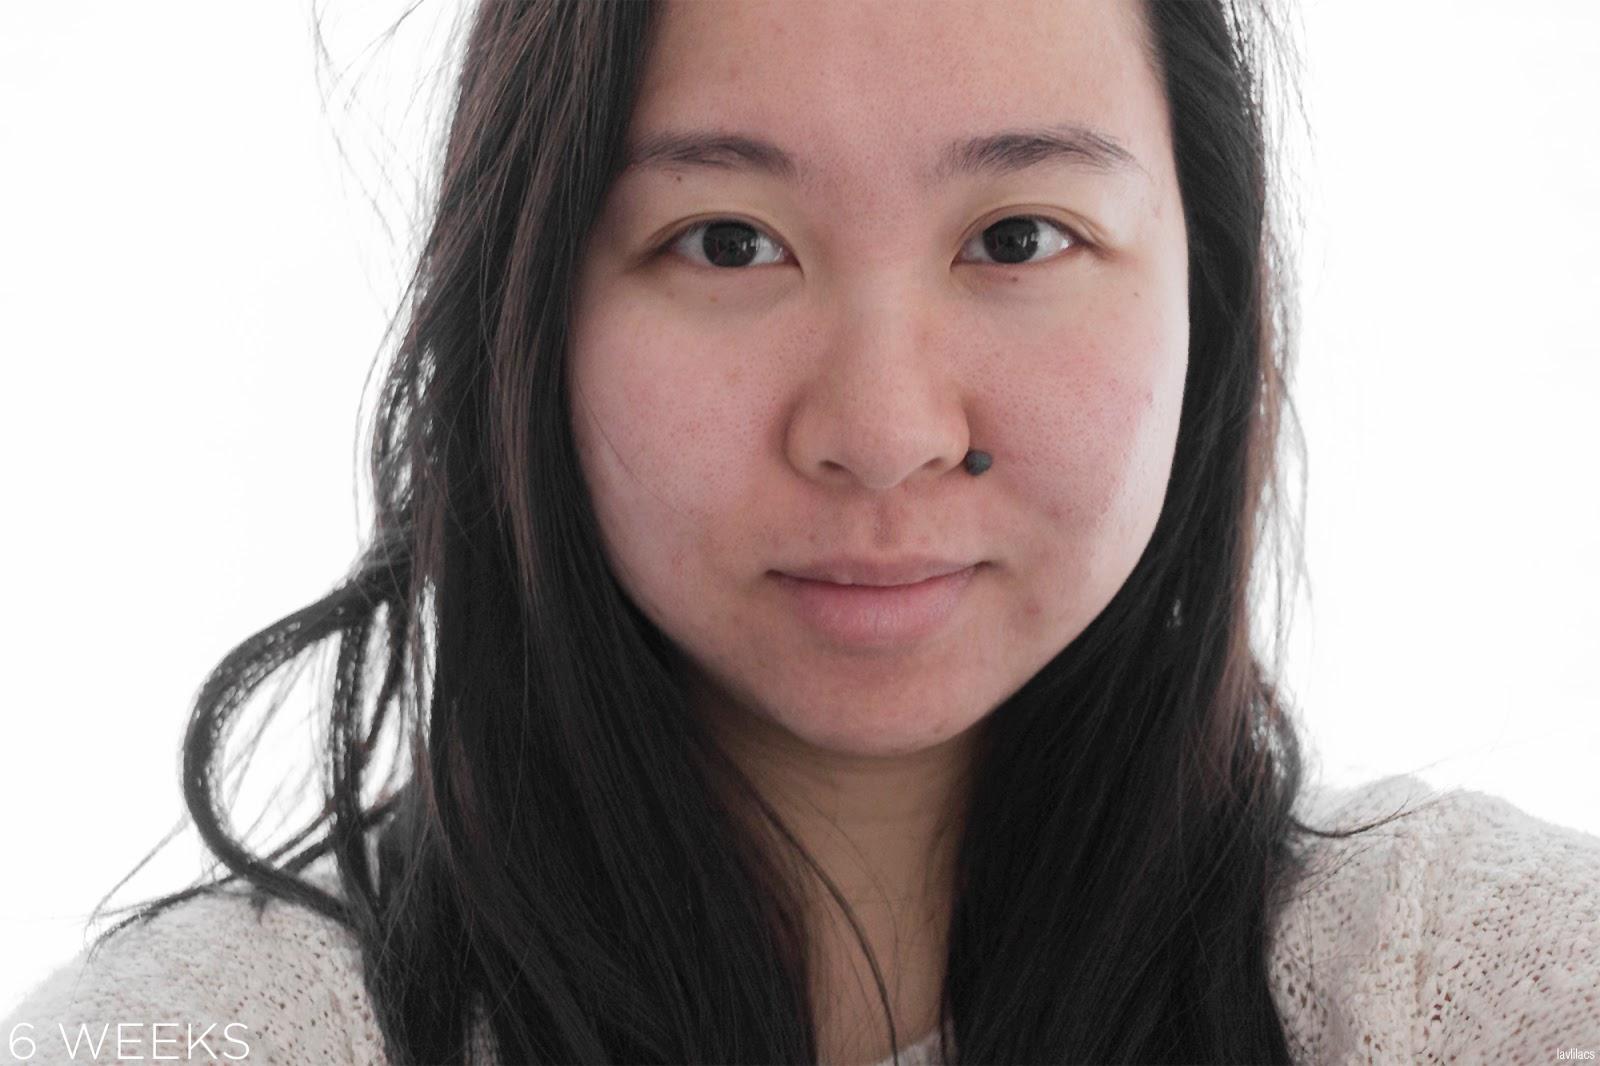 tria Hair Removal Laser Facial Hair 6 Weeks